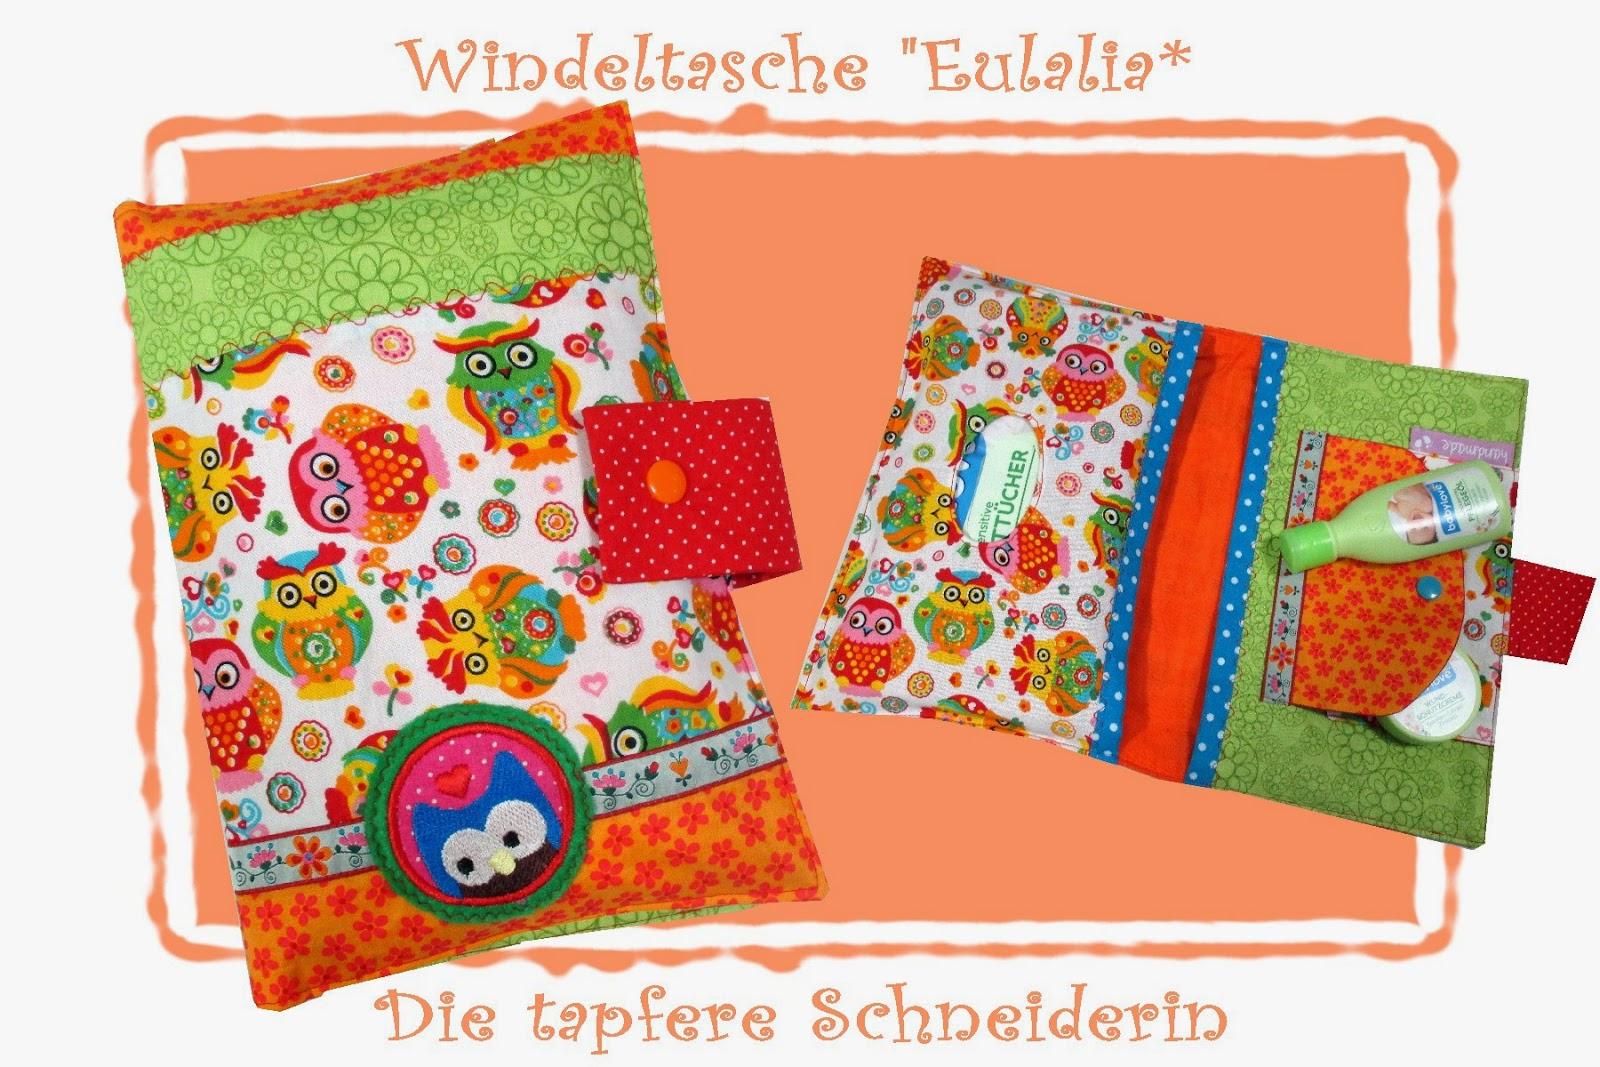 http://de.dawanda.com/product/70324875-Windeltasche-Eulalia